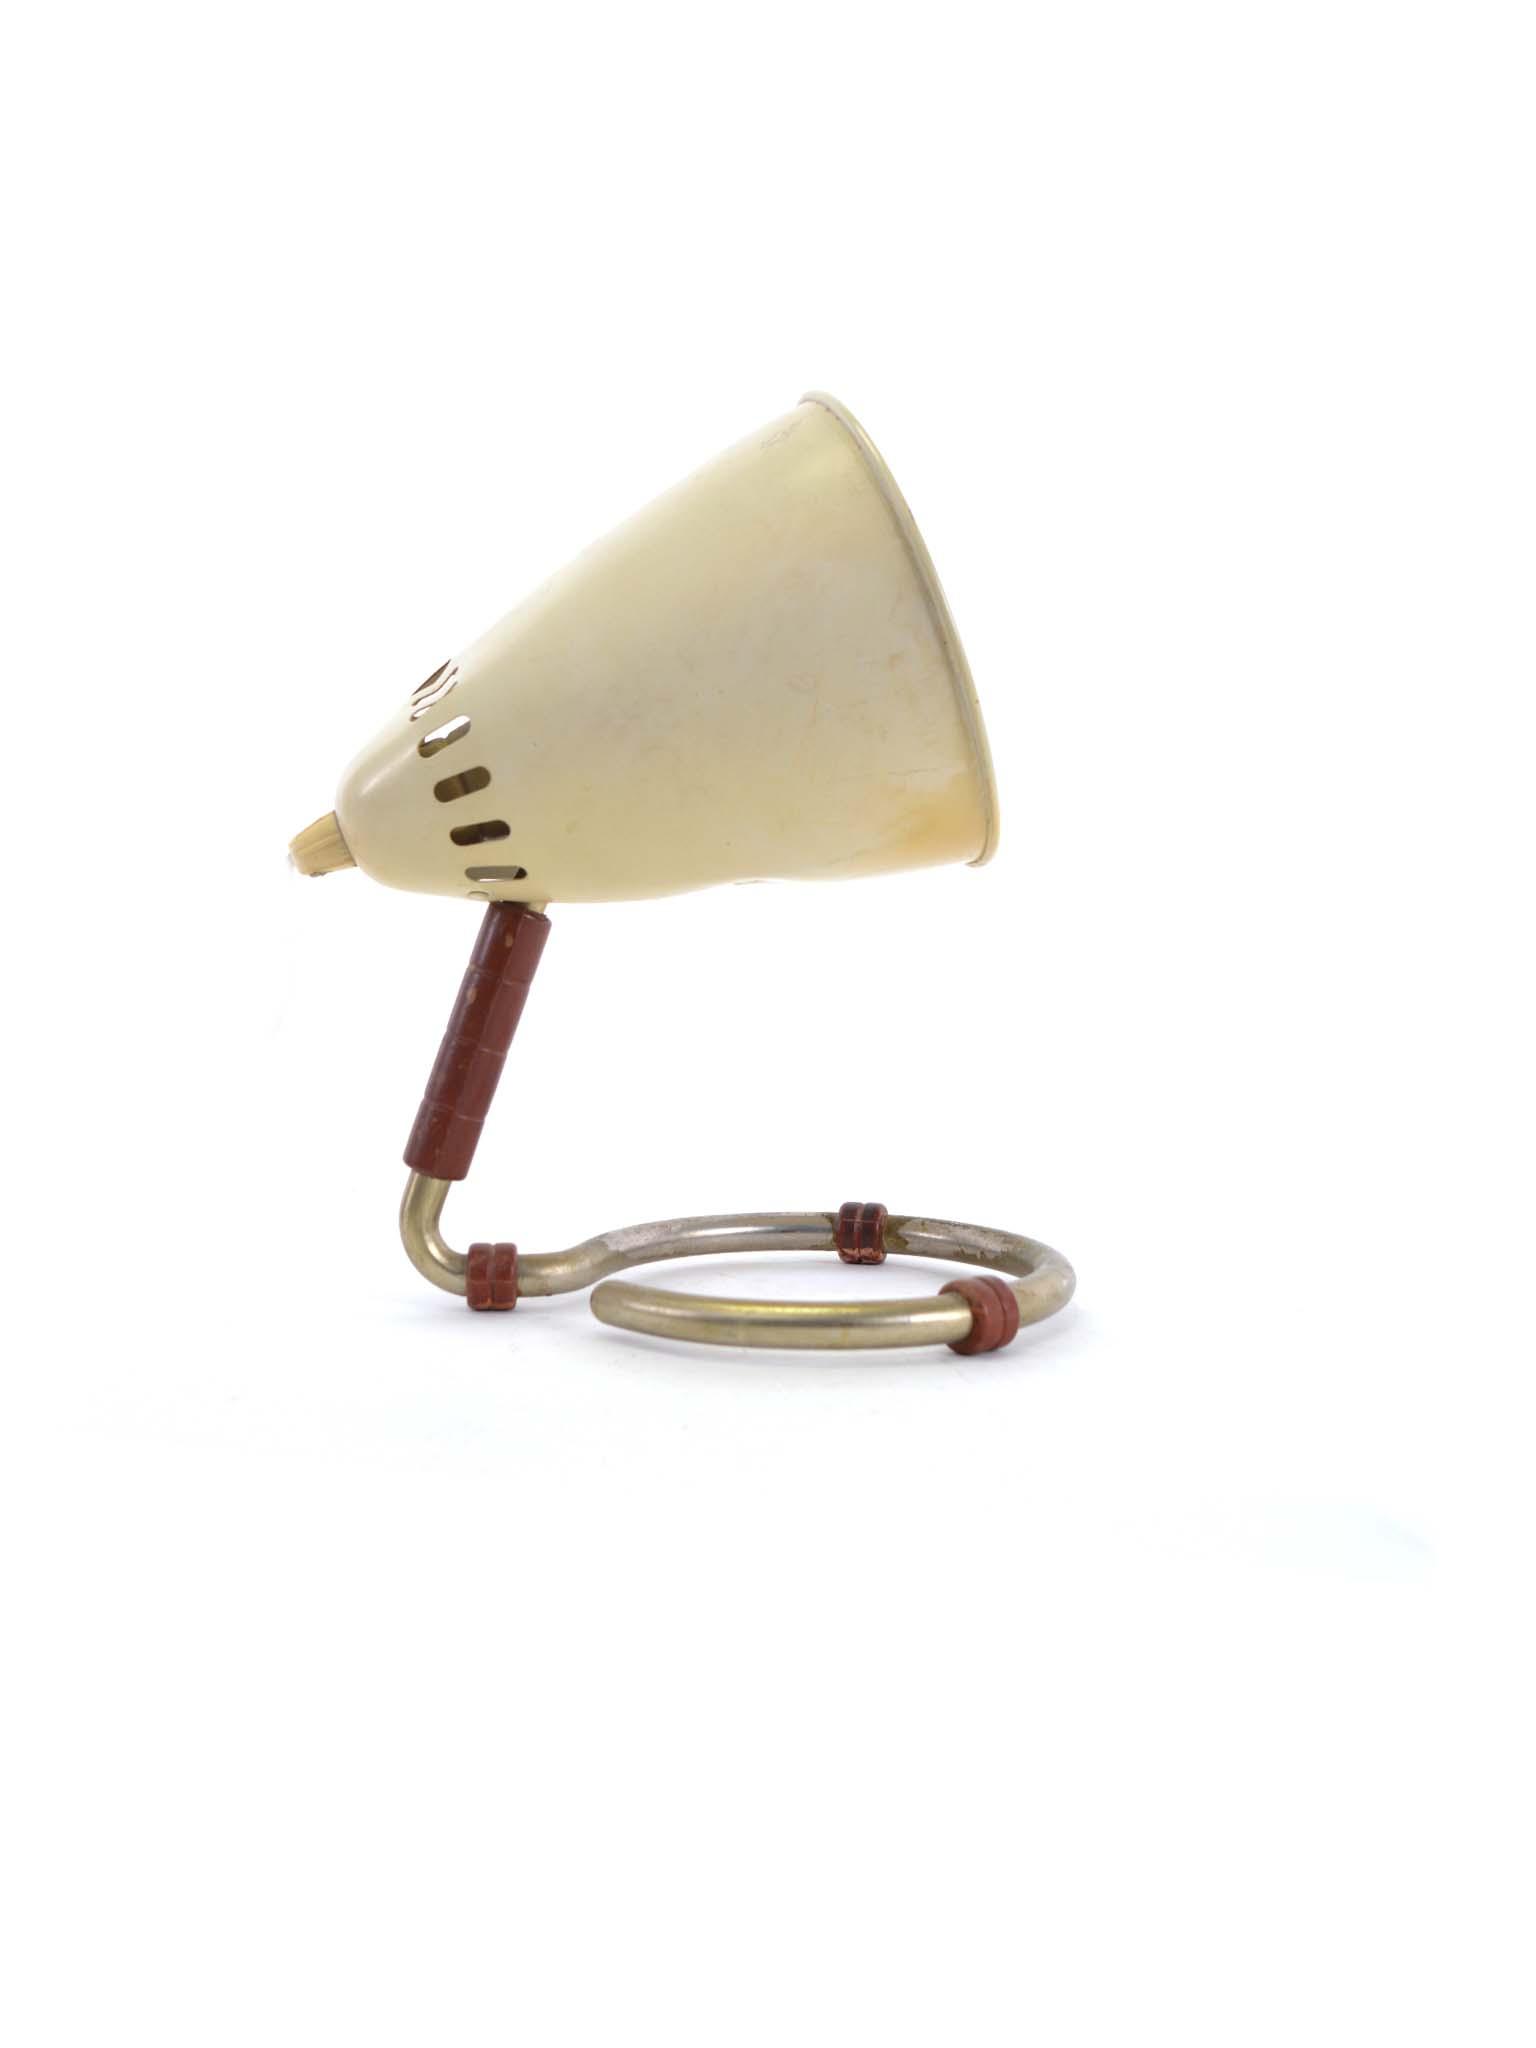 DESK LAMP UNKOWN DESIGNER